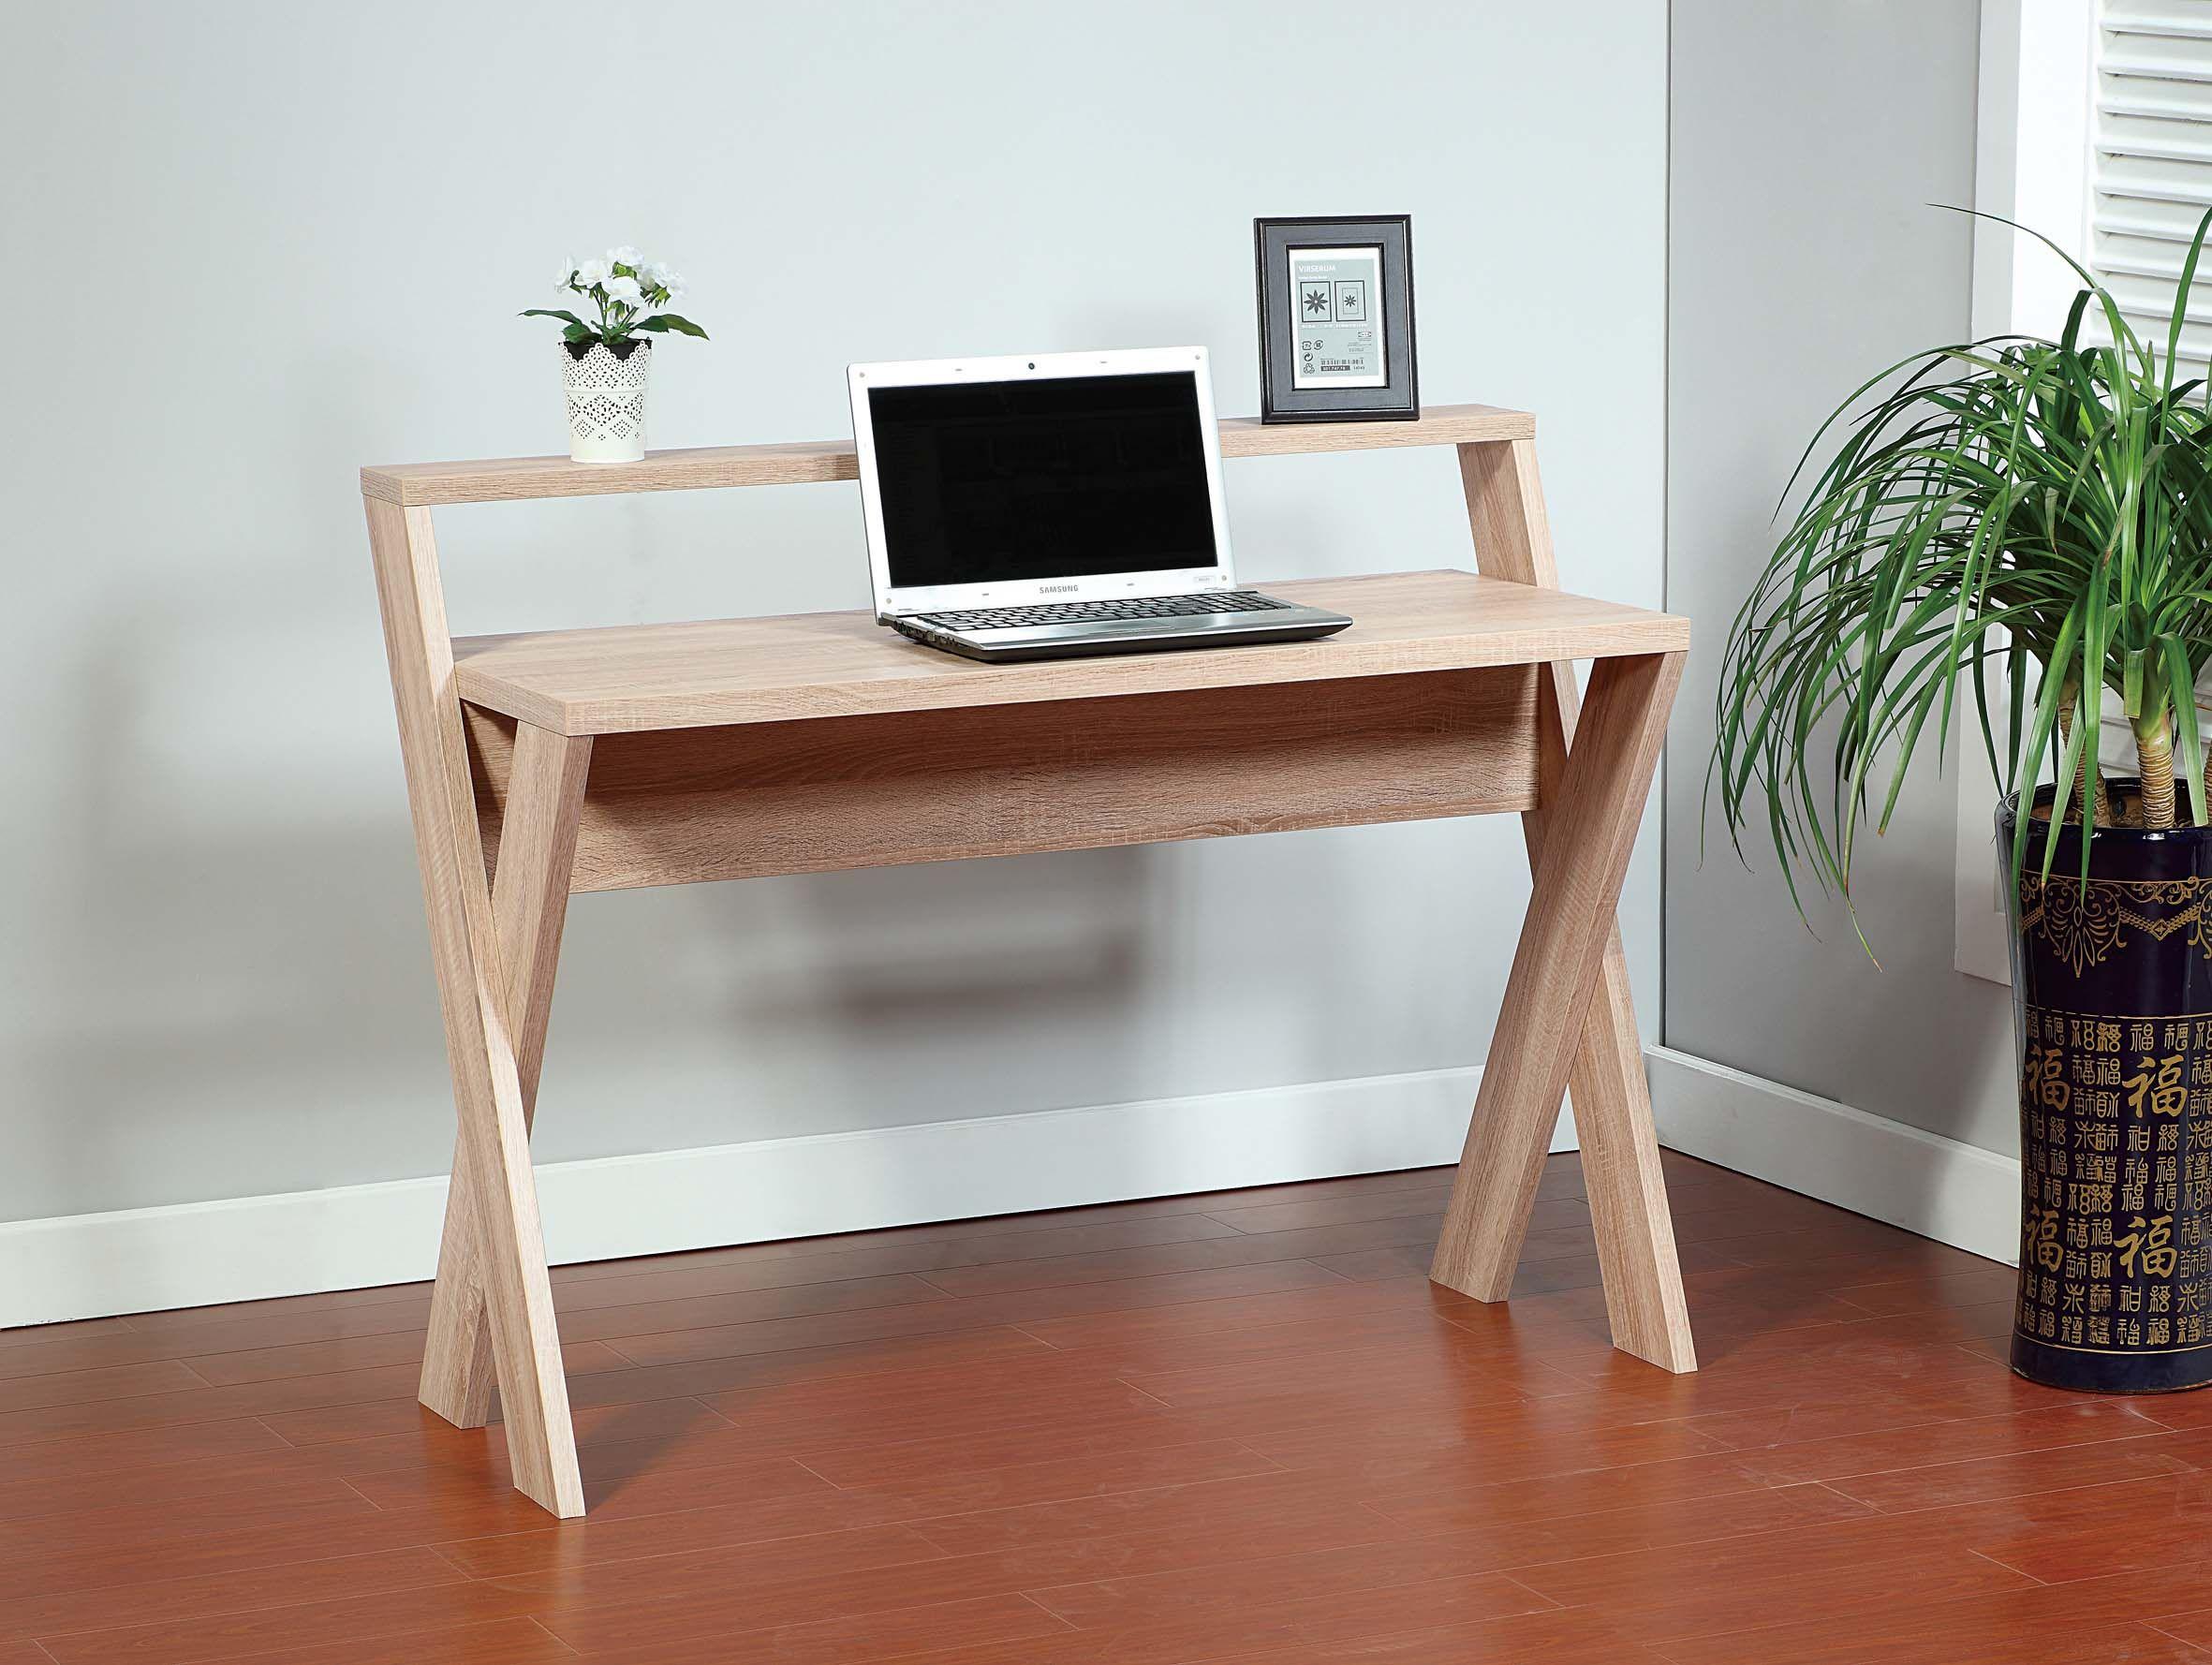 Natal Chrome And Glass Sofa Table Plush Magnum Review White Cross Leg Desk Bindu Bhatia Astrology